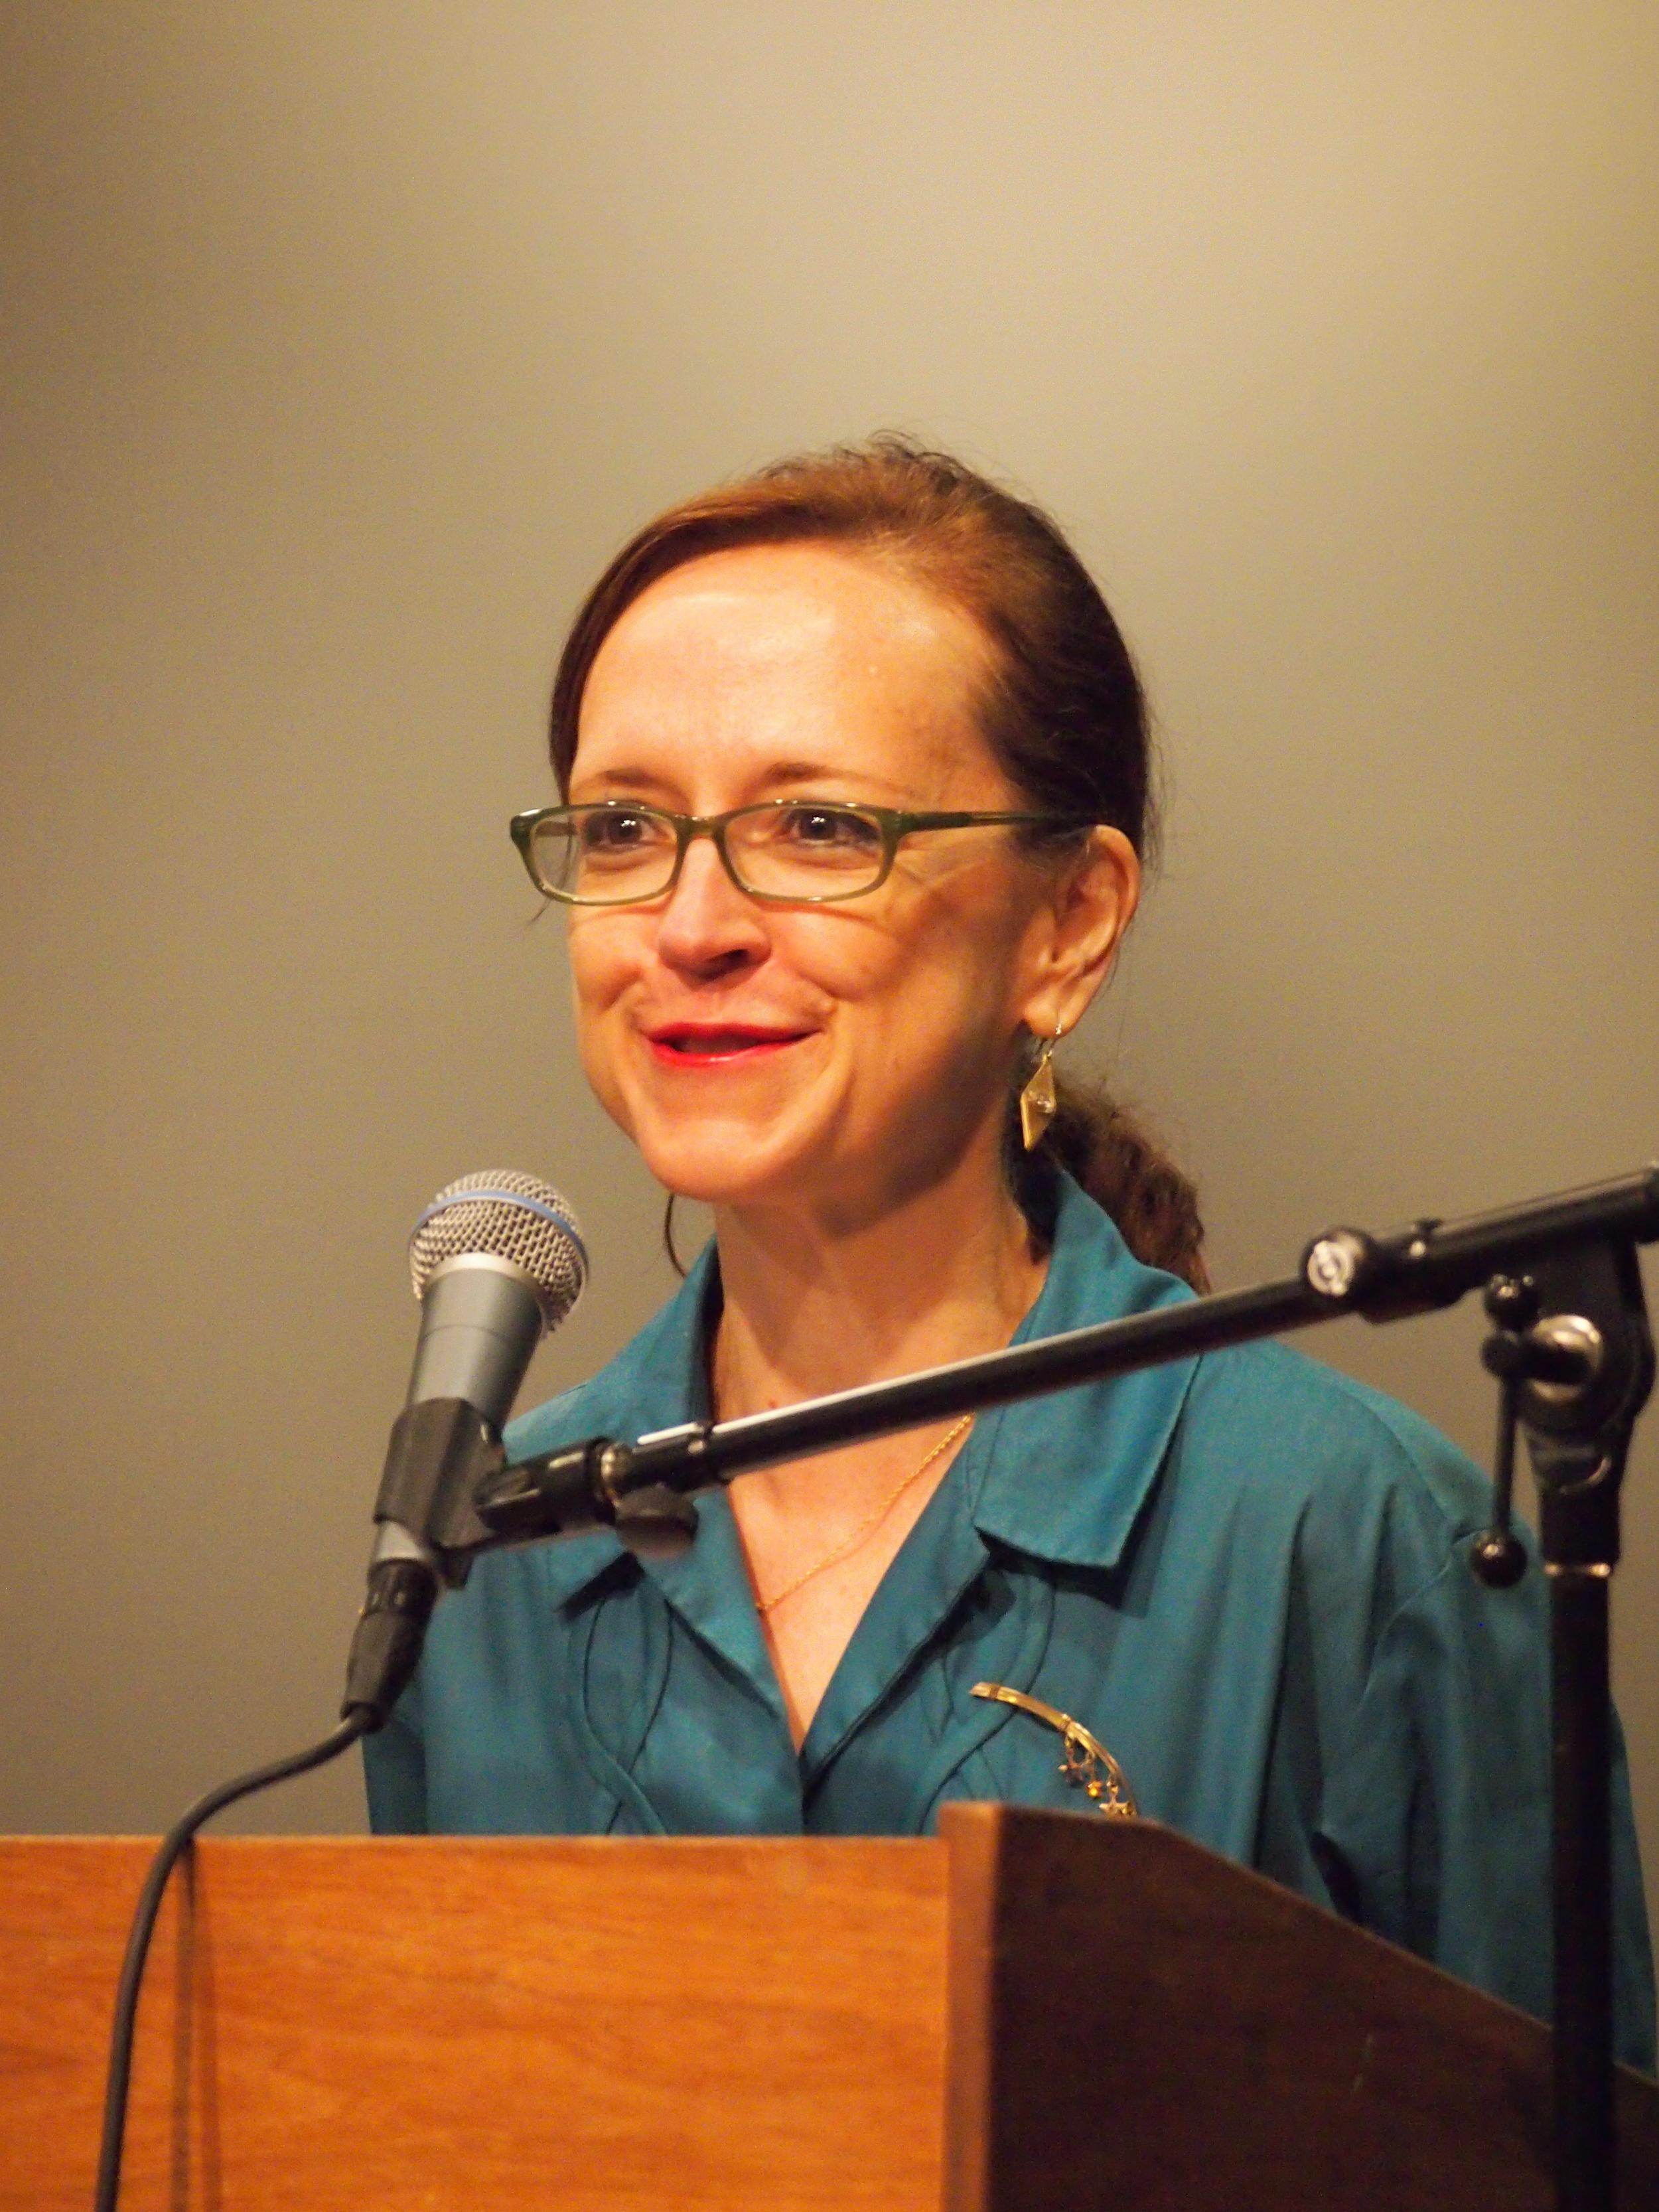 Megan Abbot (Source: Wikipedia)